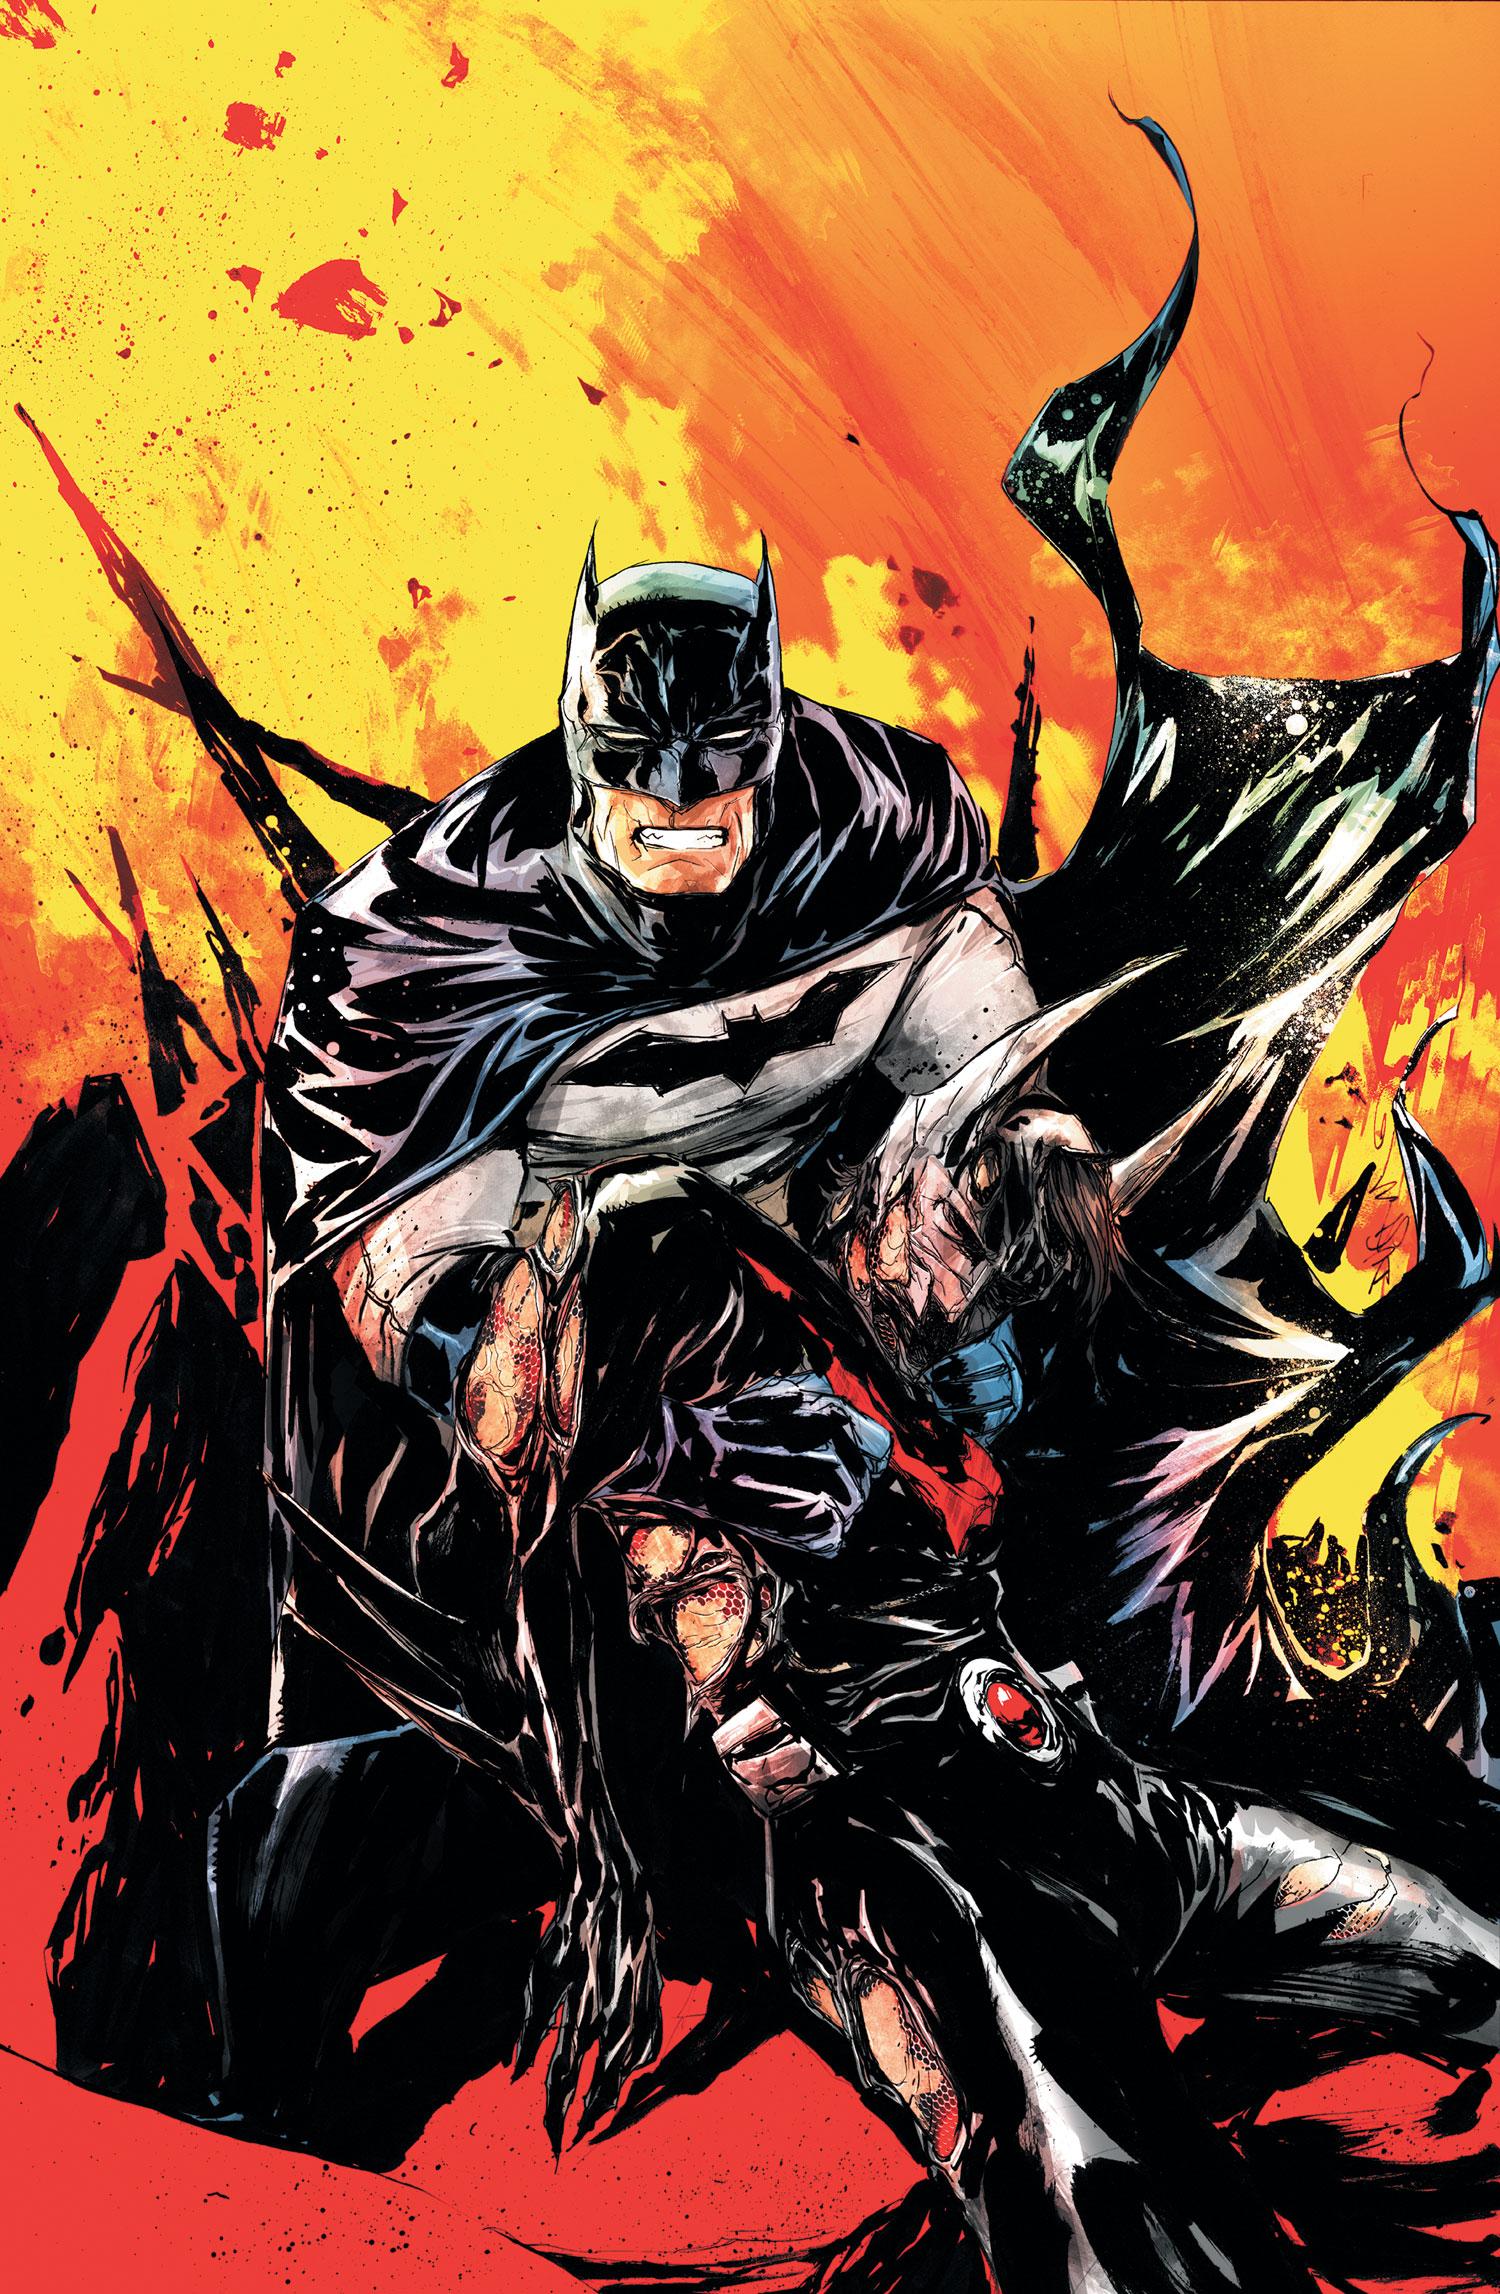 Image - Batman Beyond Unlimited Vol 1 8 Textless.jpg - DC ...New 52 Batman Beyond